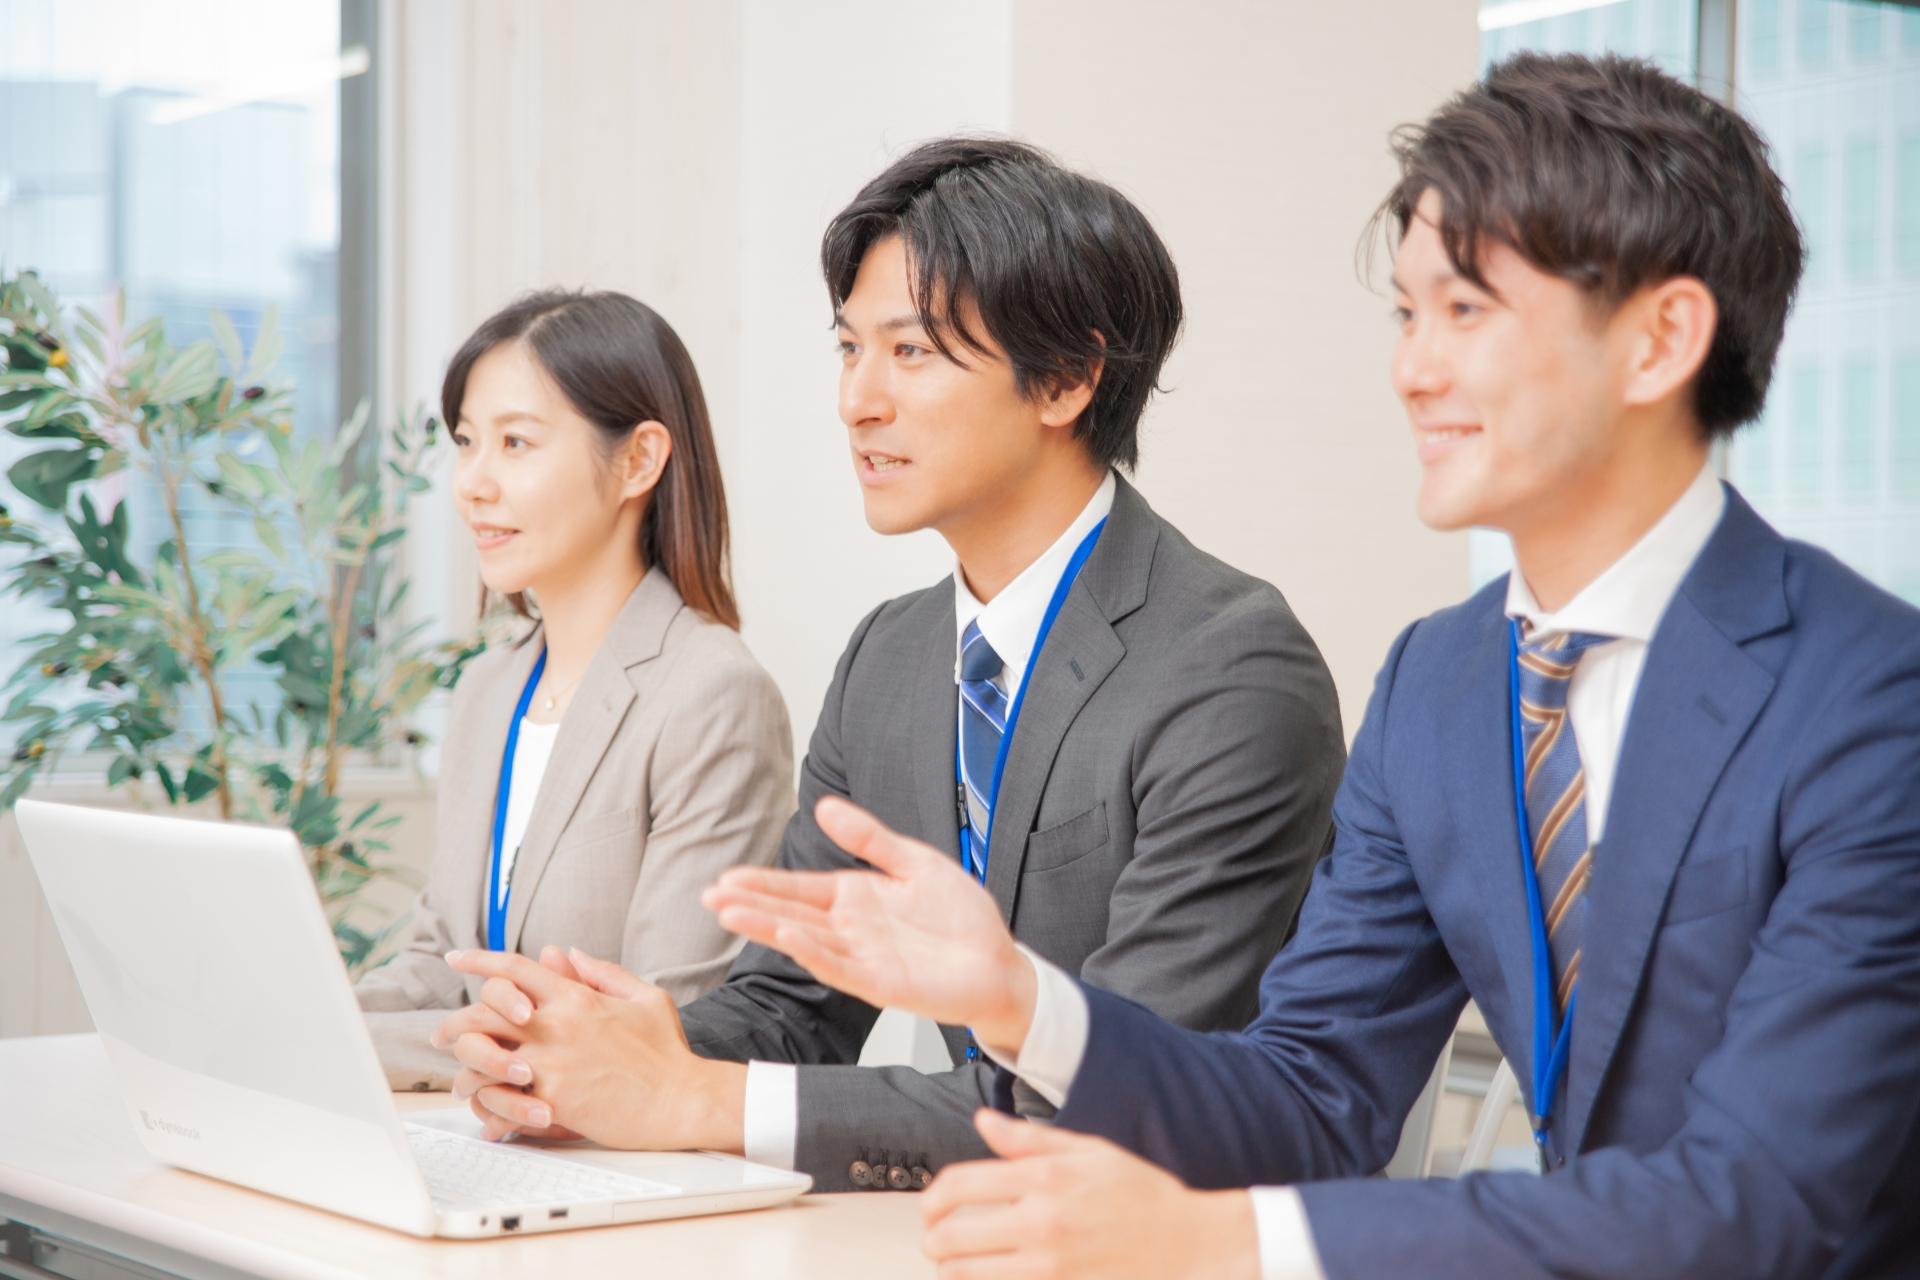 4191346 m - 持続化補助金(低感染リスク型ビジネス枠)の内容・申請方法